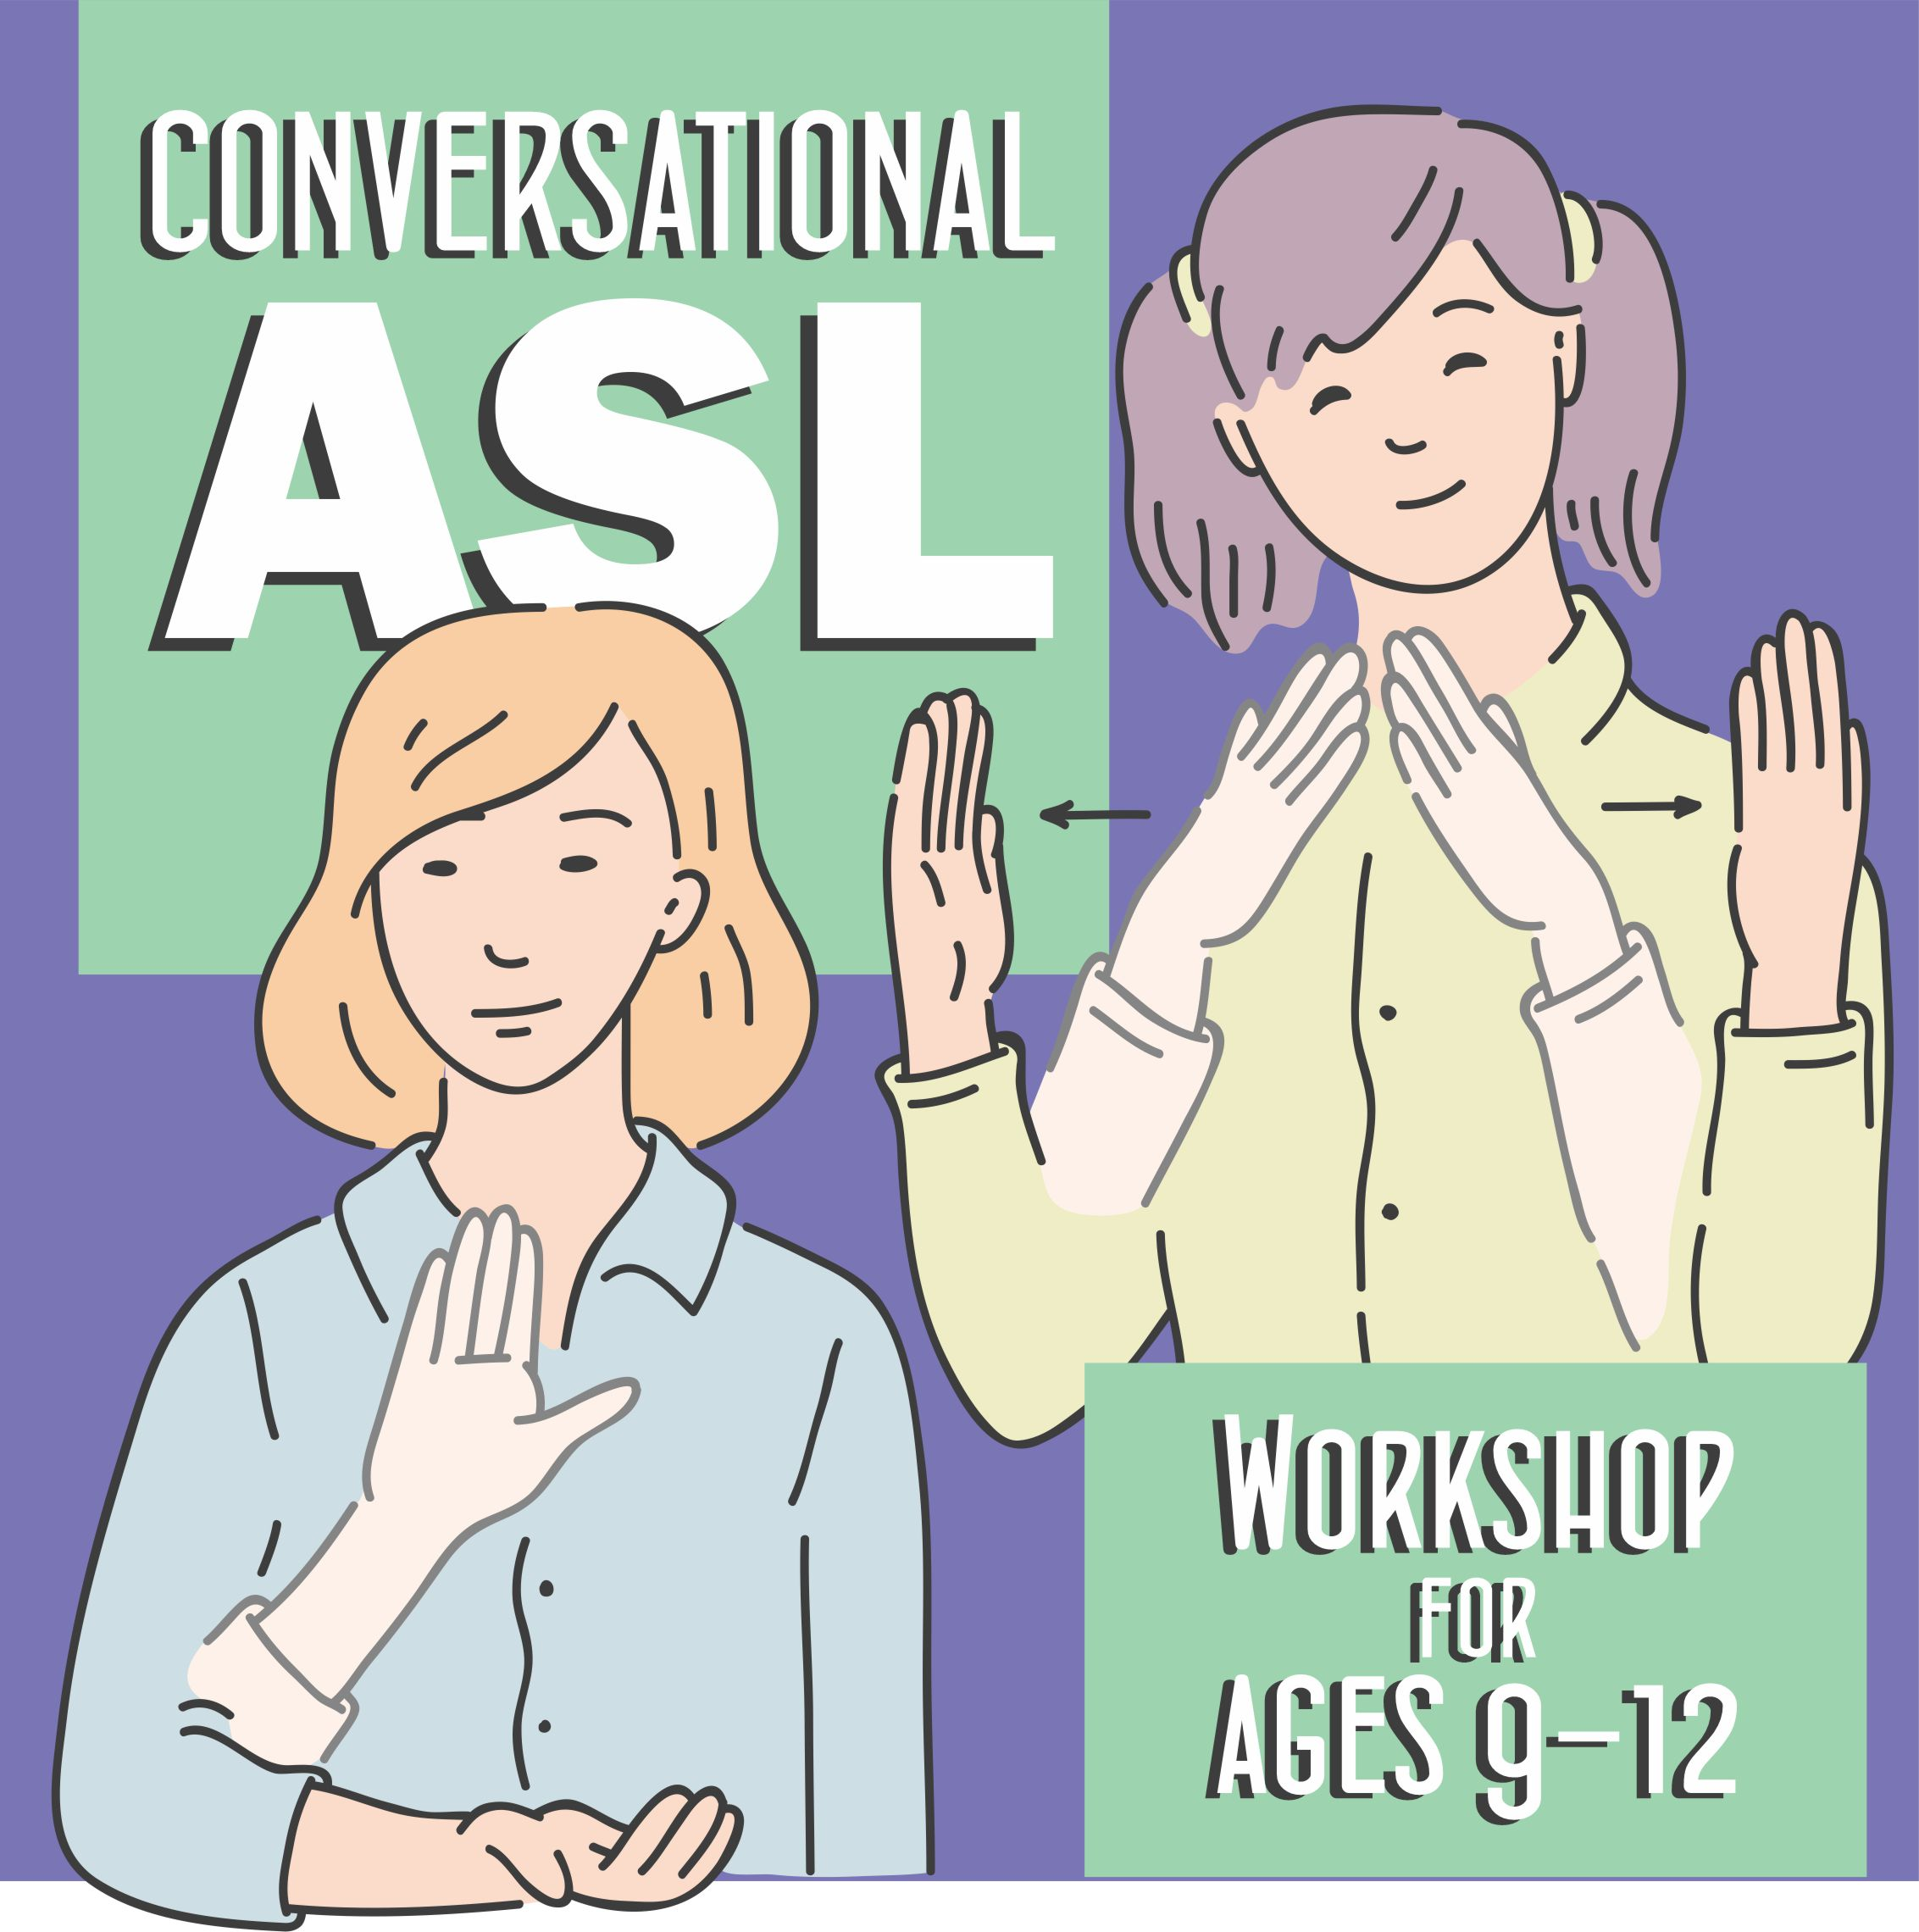 Conversational ASL Workshop